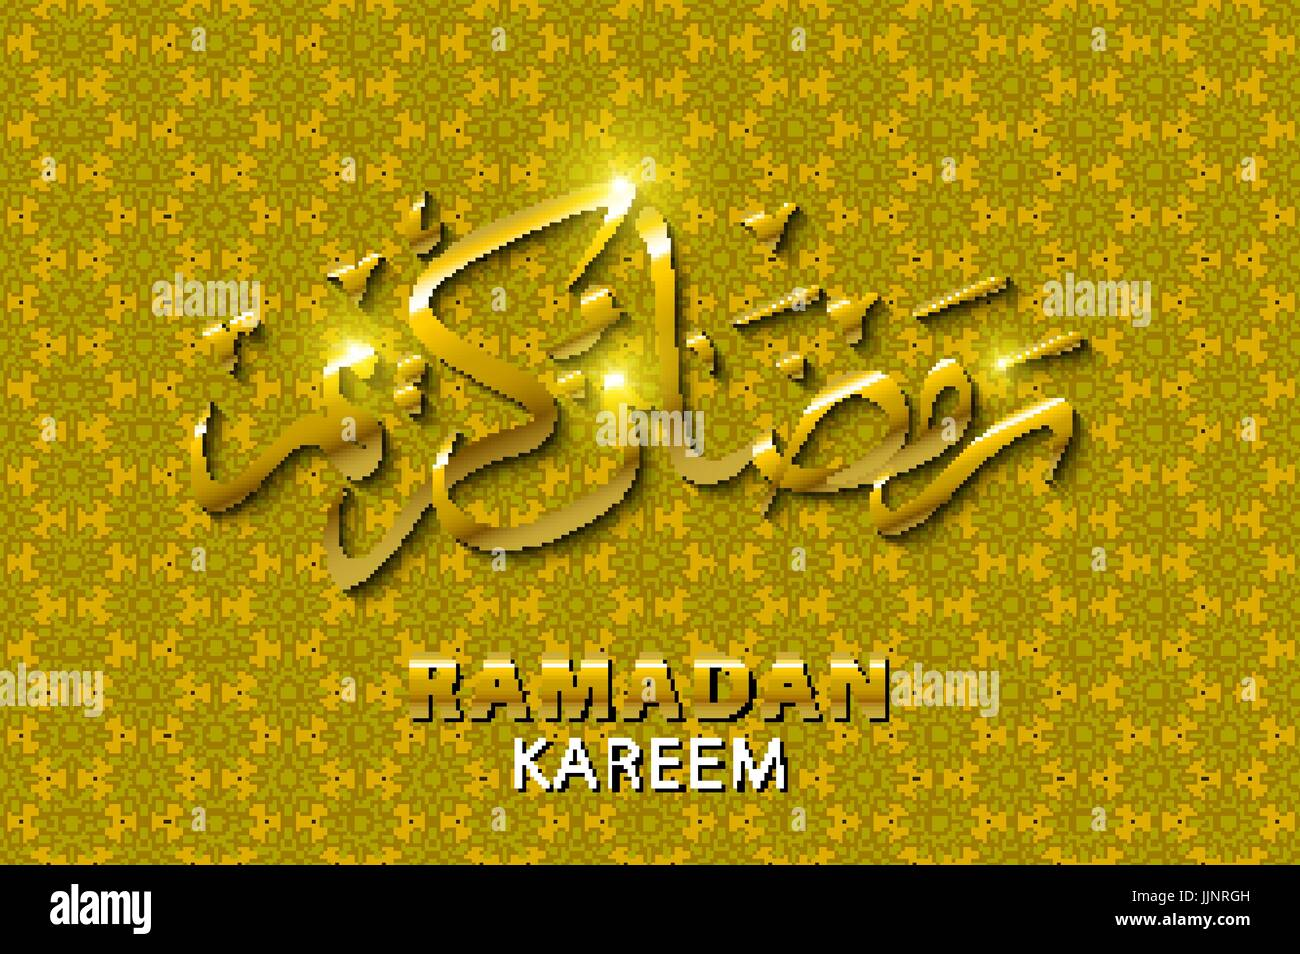 Greeting During Ramadan Yelomphonecompany